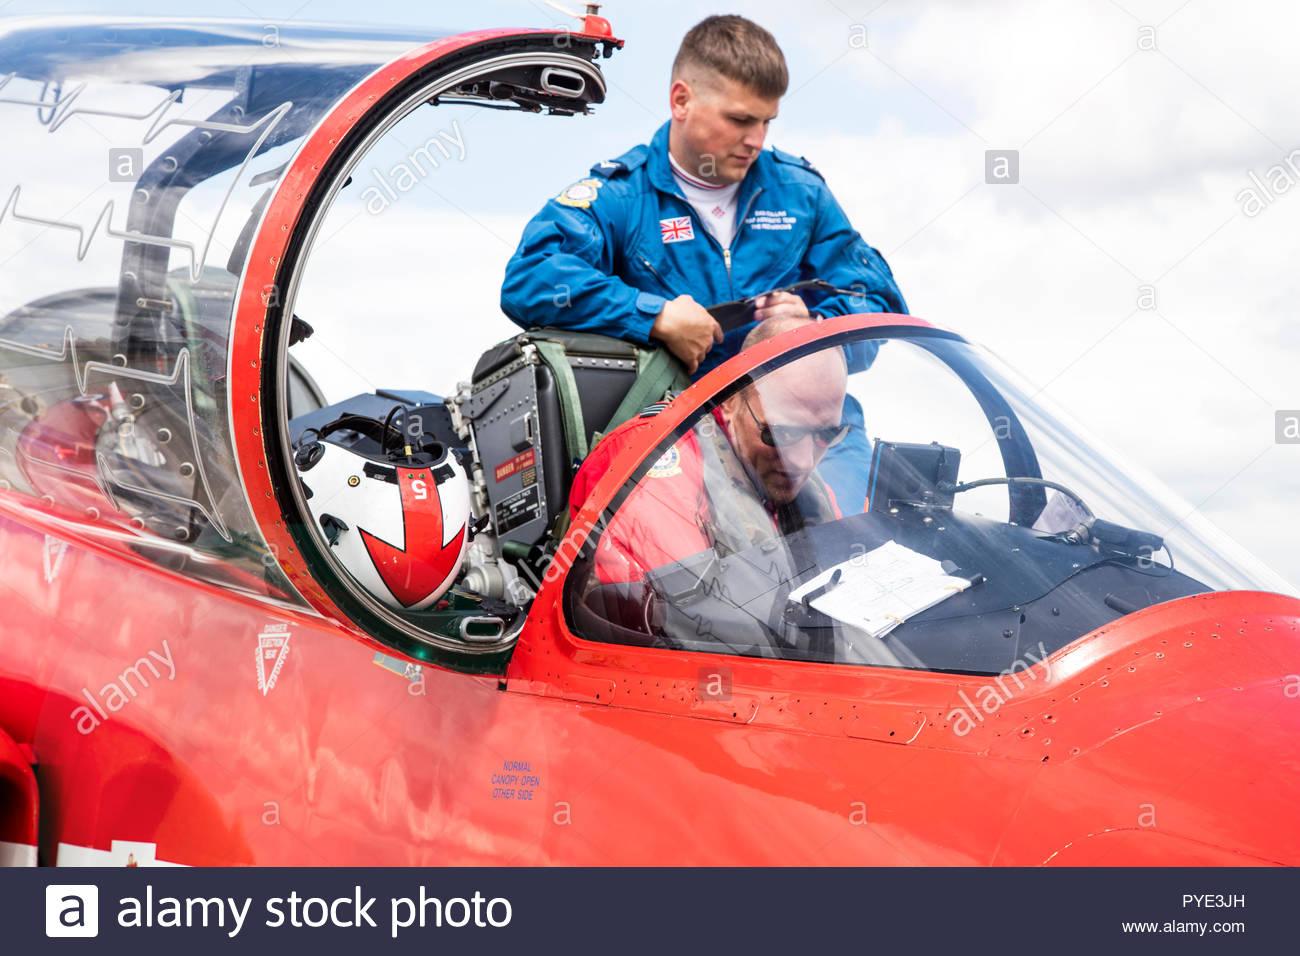 Red Arrows pilots in cockpit on RAF Scrampton, UK Stock Photo